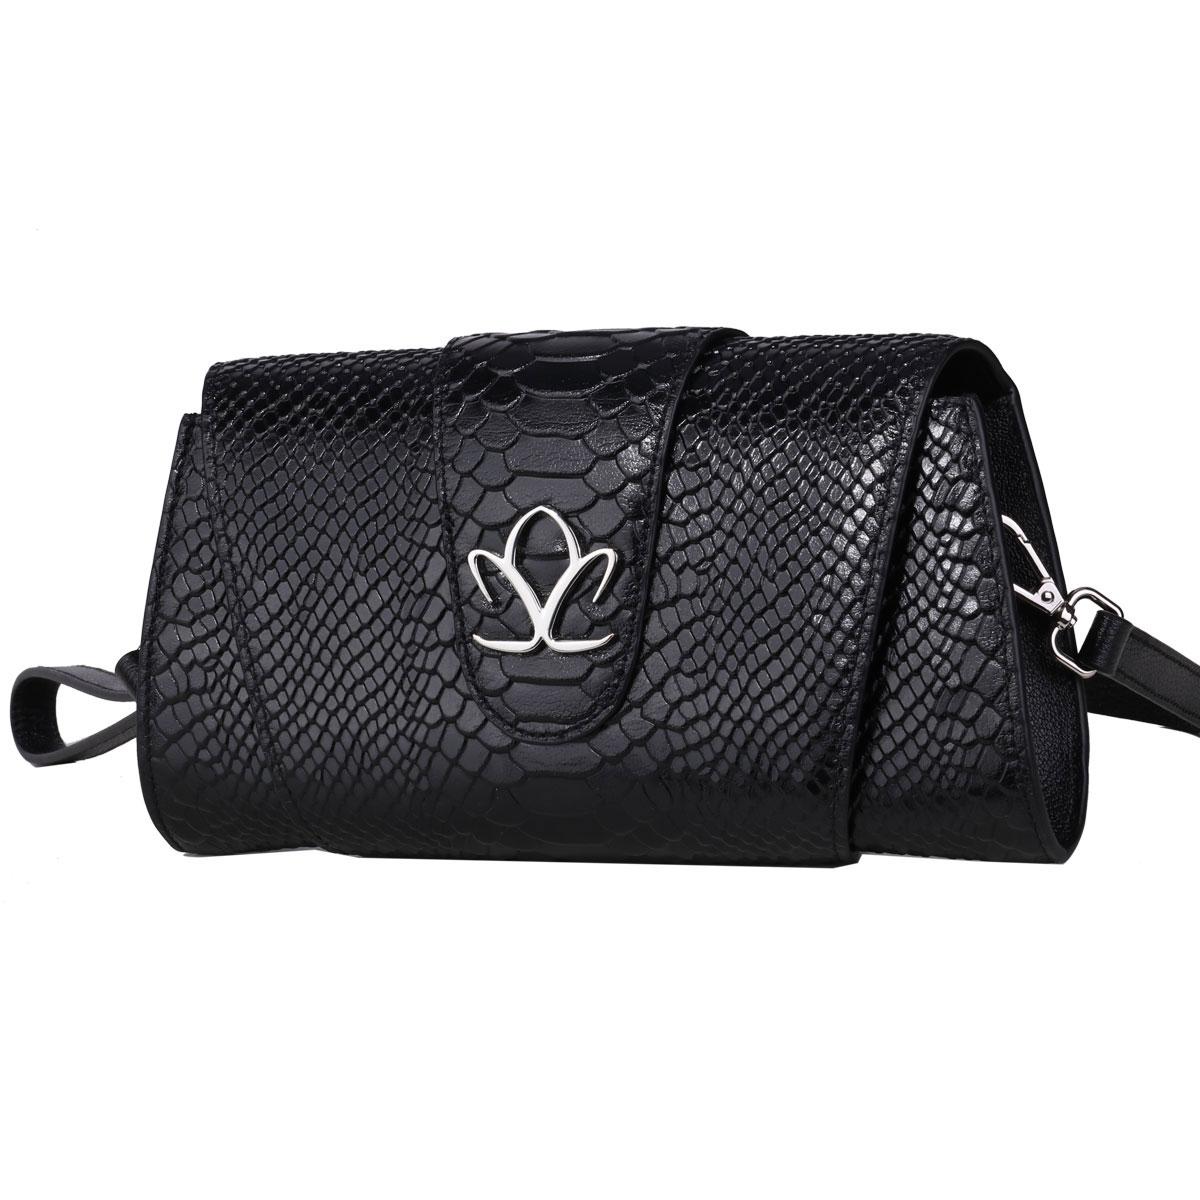 Cashs Ireland, Top Grain Leather Fionna Black Clutch Handbag